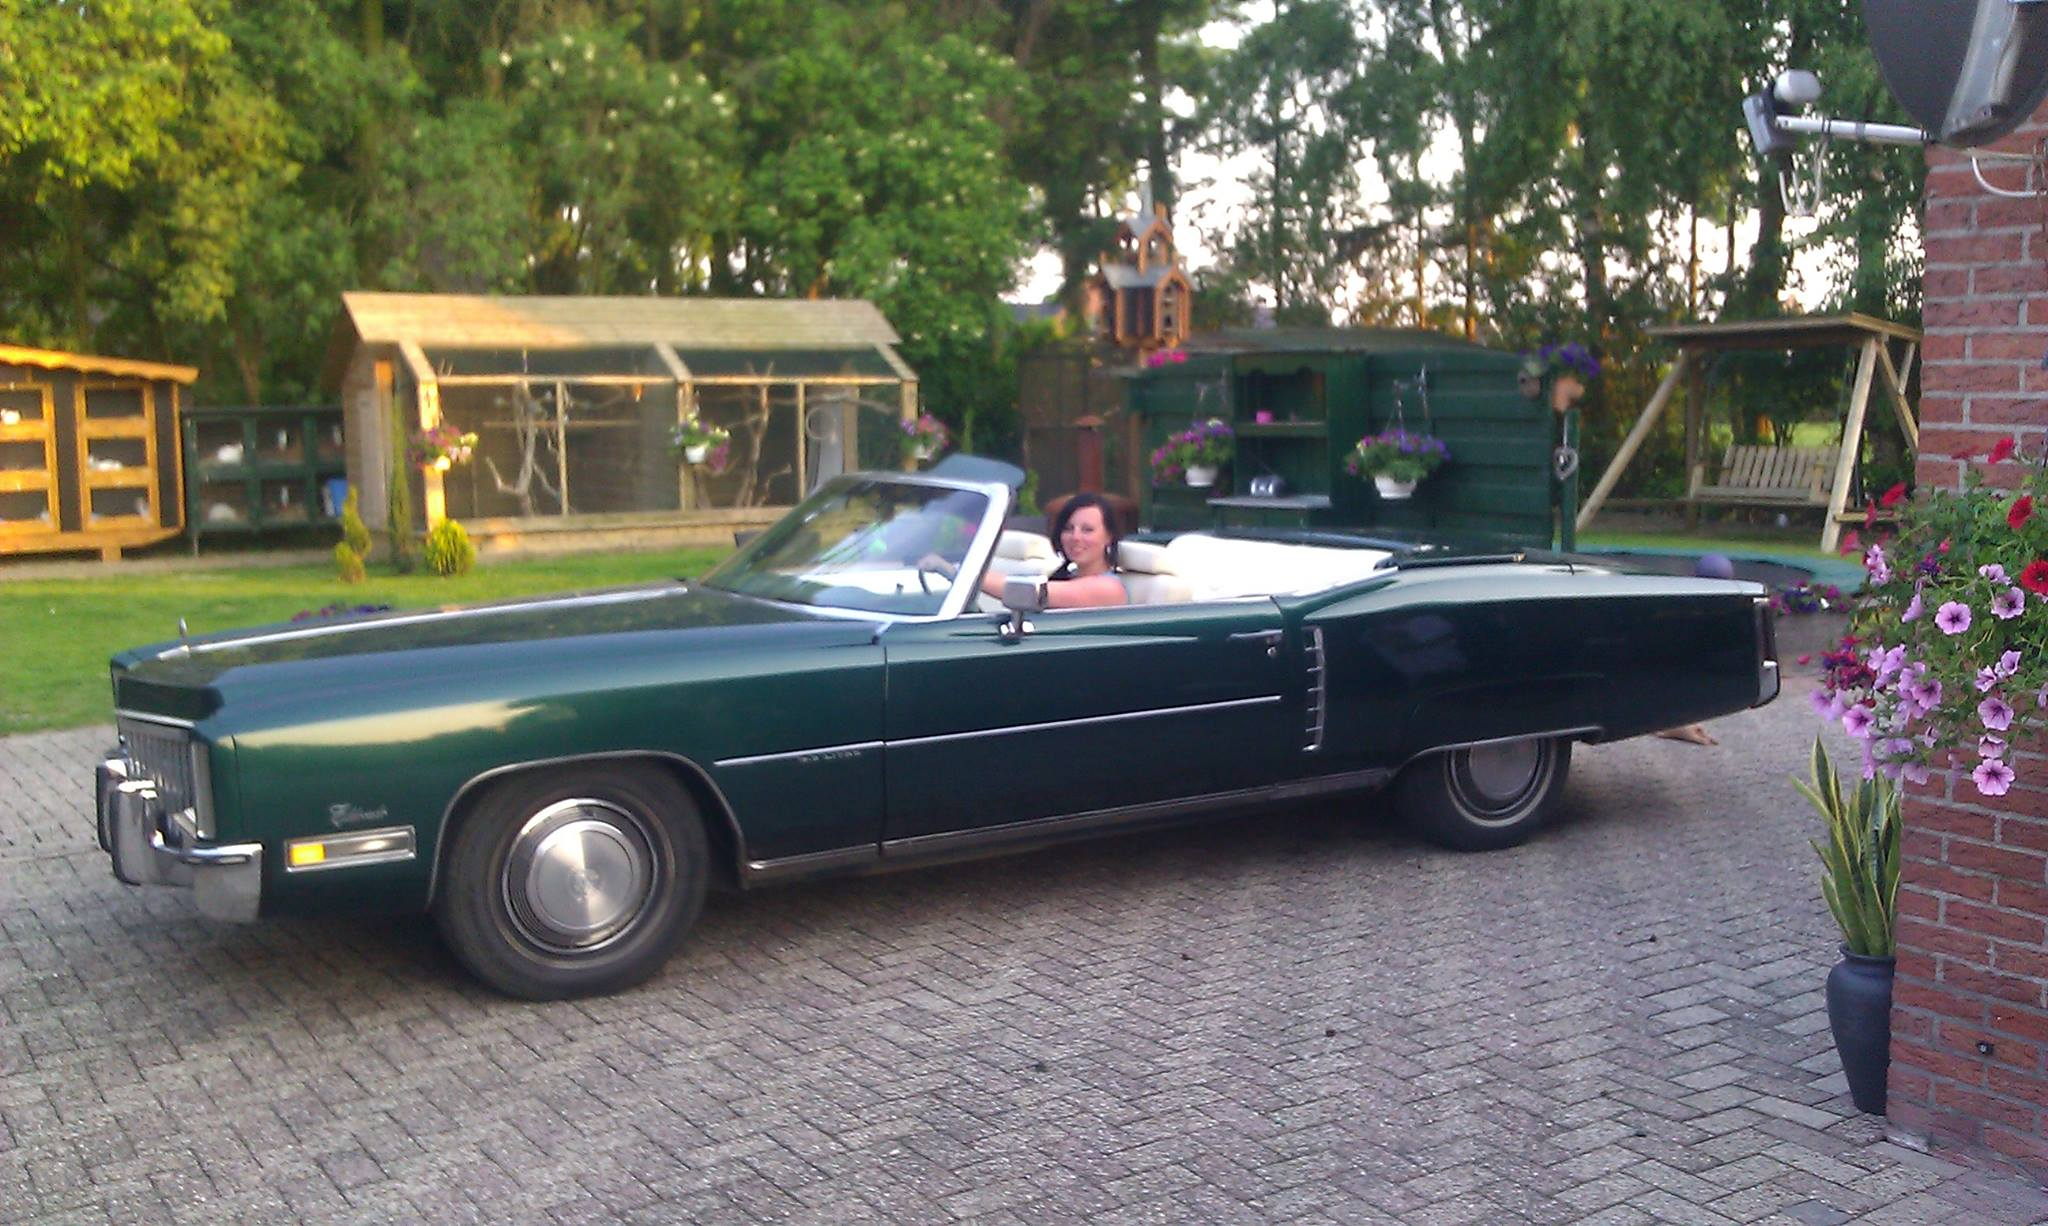 1972 Cadillac Eldorado Lizzy Schut.jpg